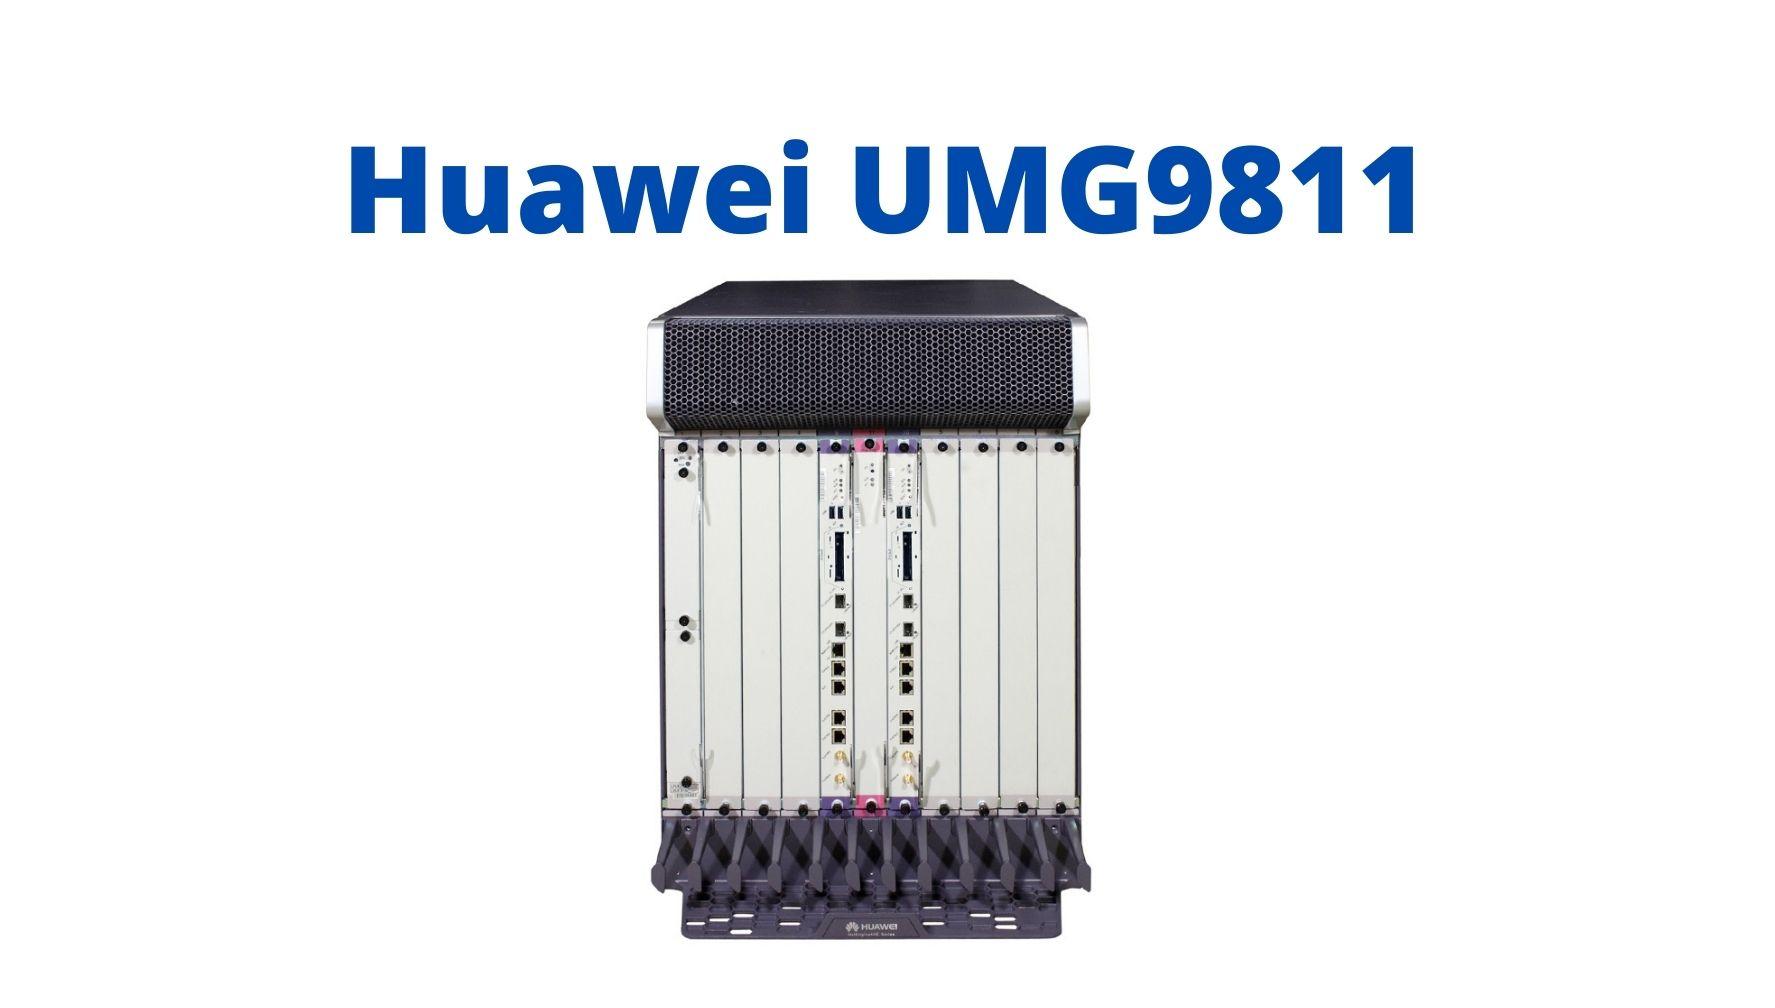 Huawei UMG9811